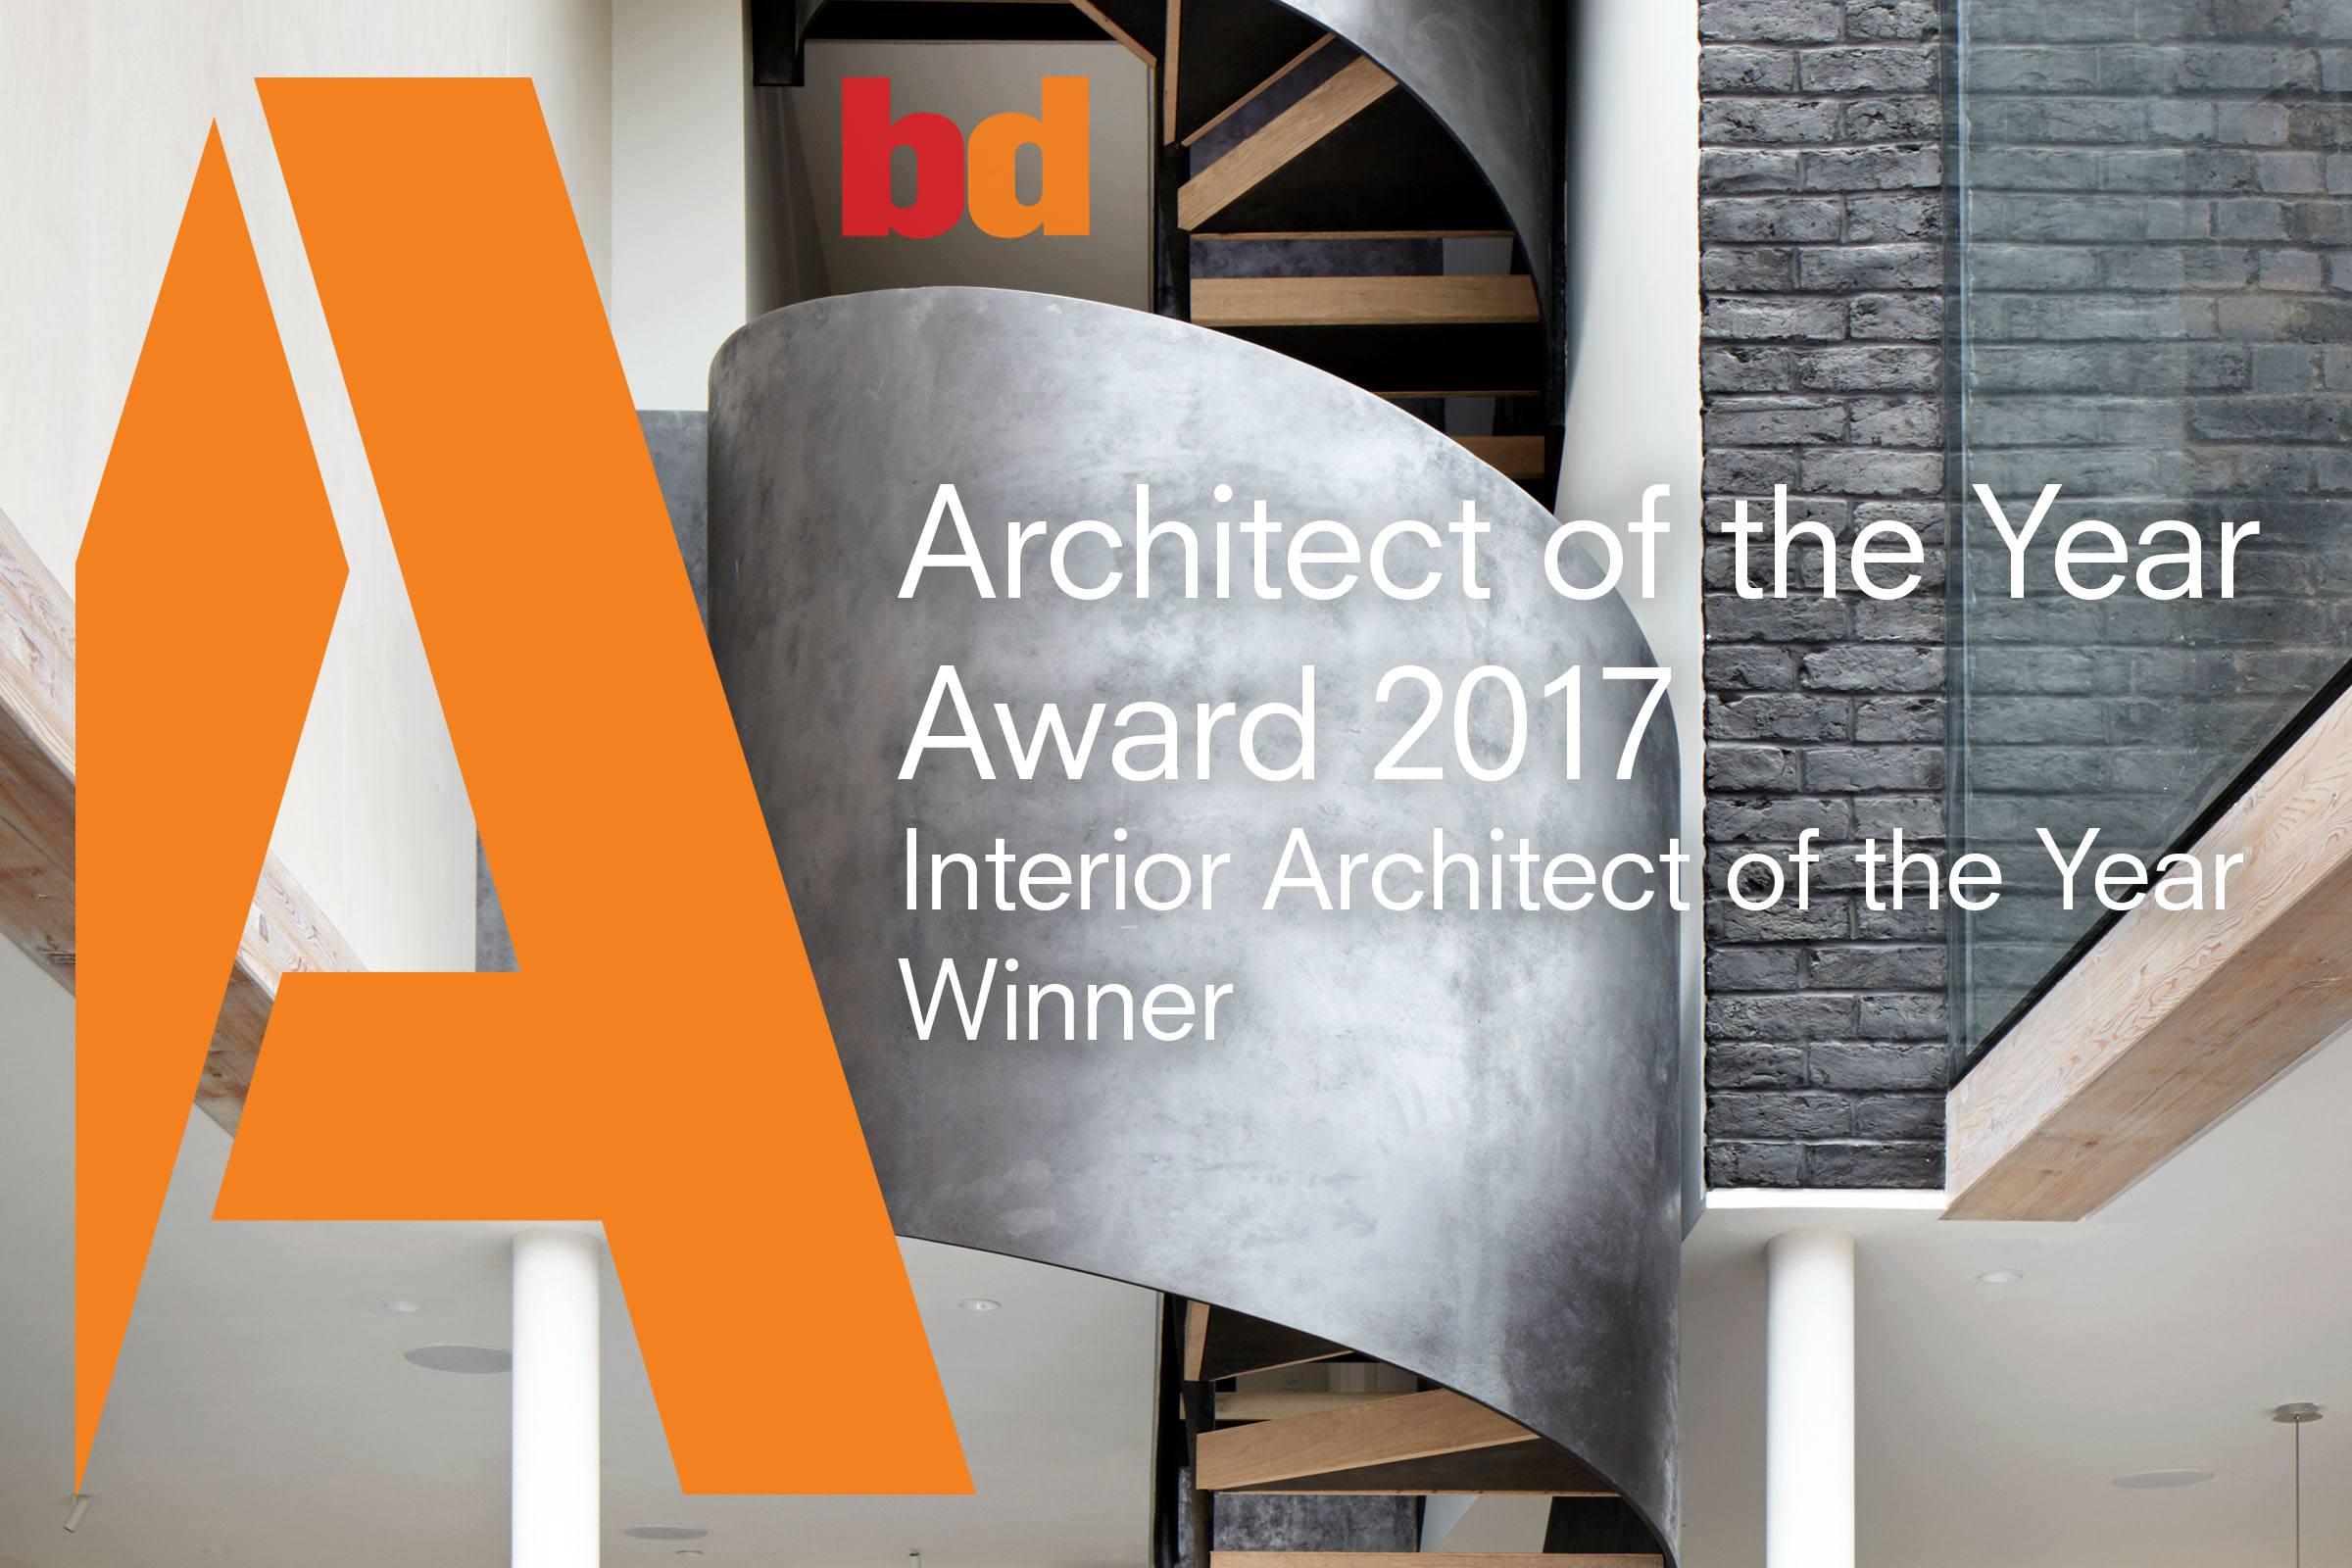 Architect of the Year Awards